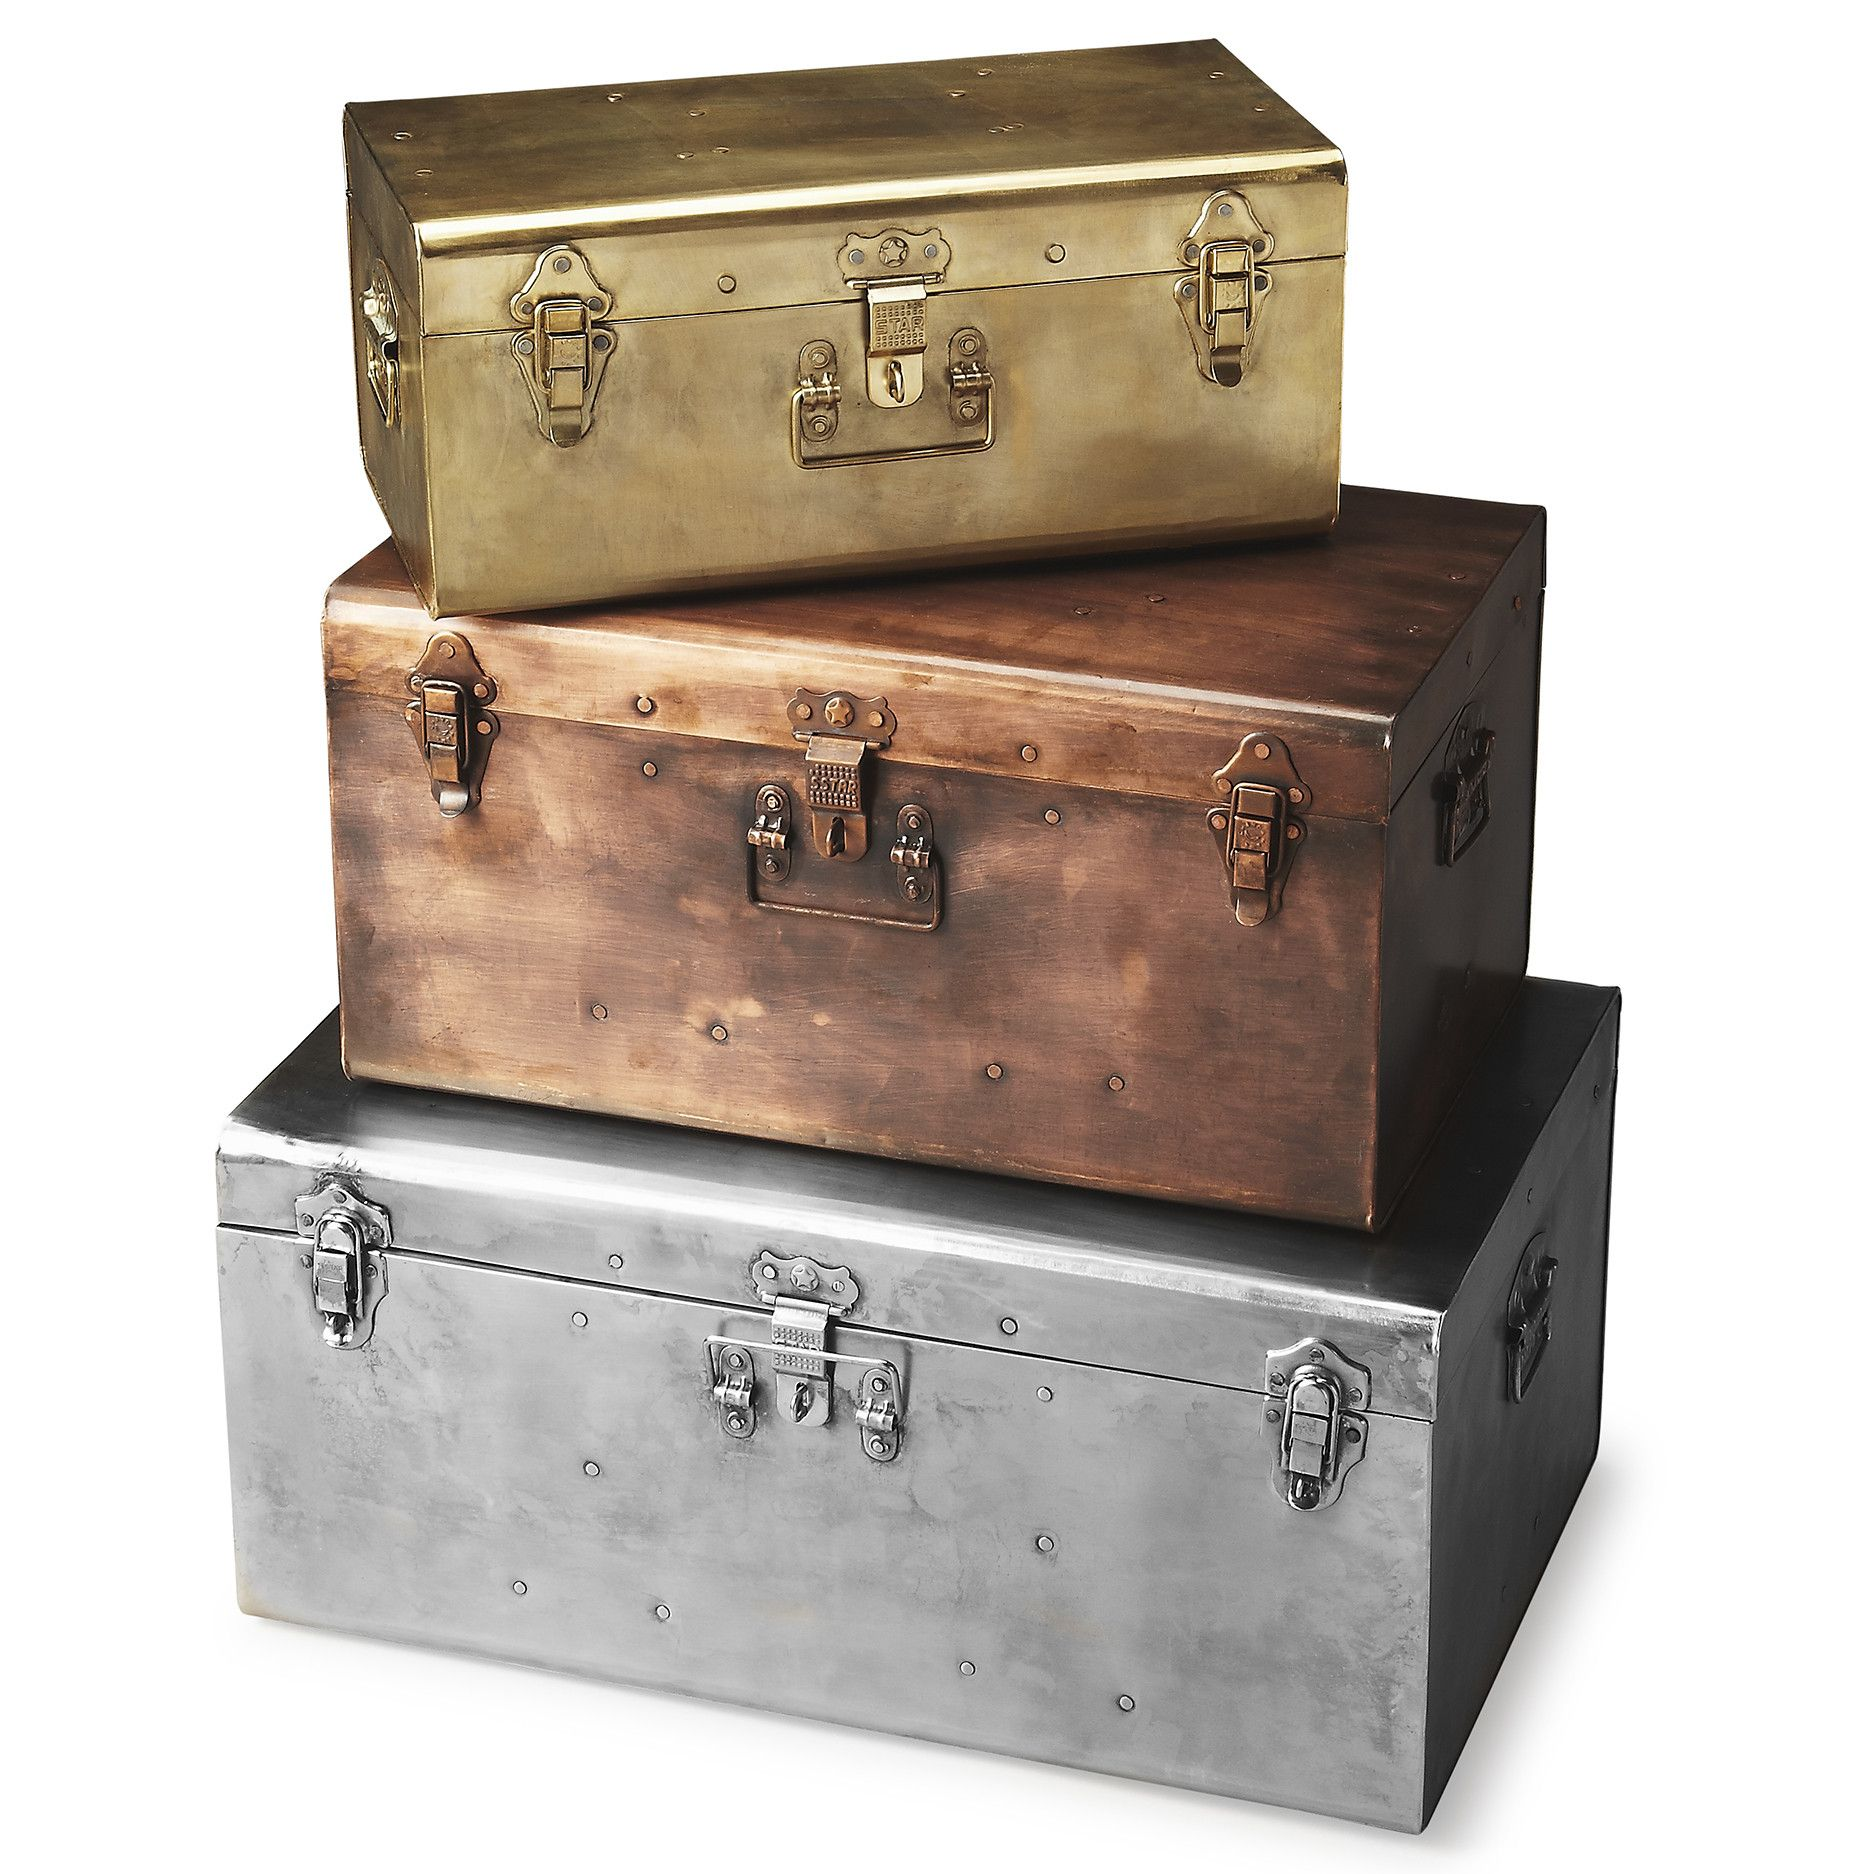 Industrial Modern Storage Trunk Set of 3  sc 1 st  Pinterest & Industrial Modern Storage Trunk Set of 3 | Decor | Pinterest ...